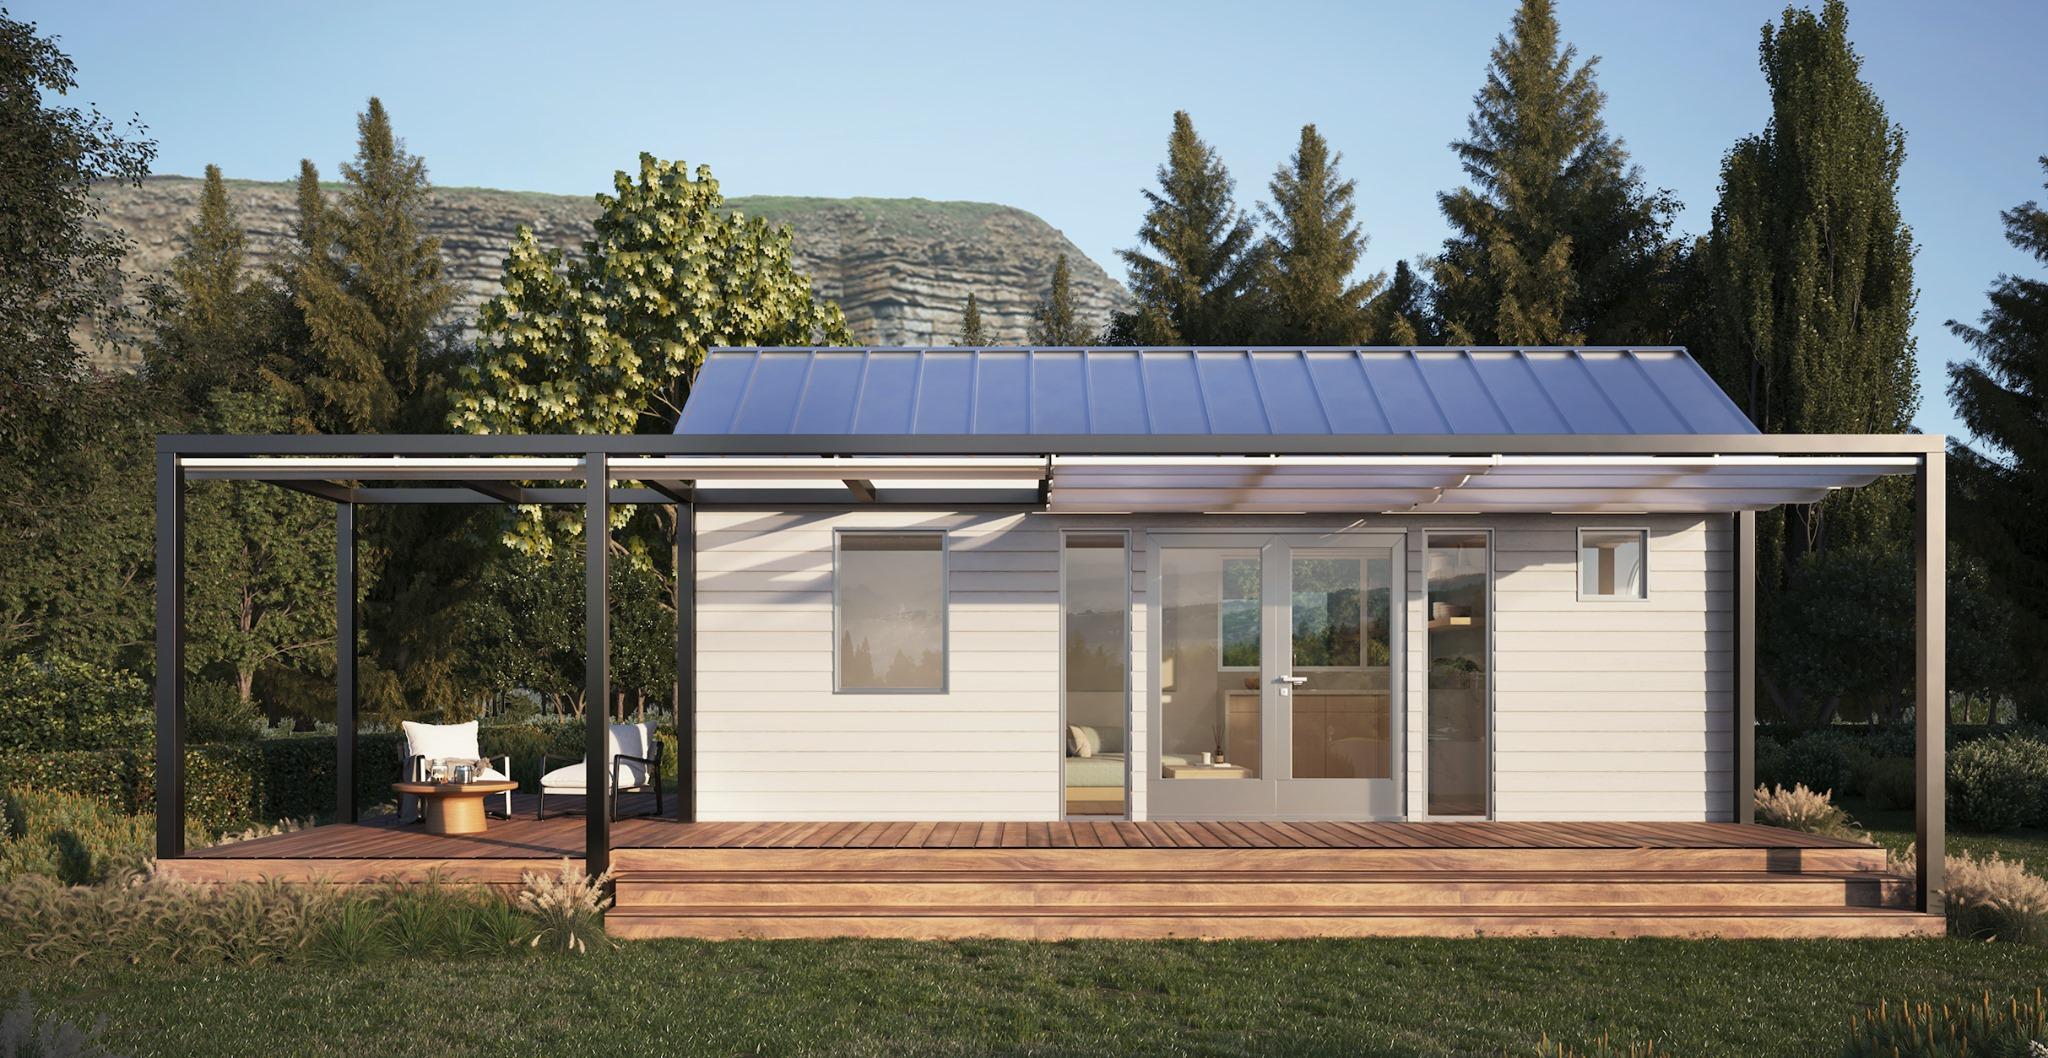 Sol Haus Design Joins THIA